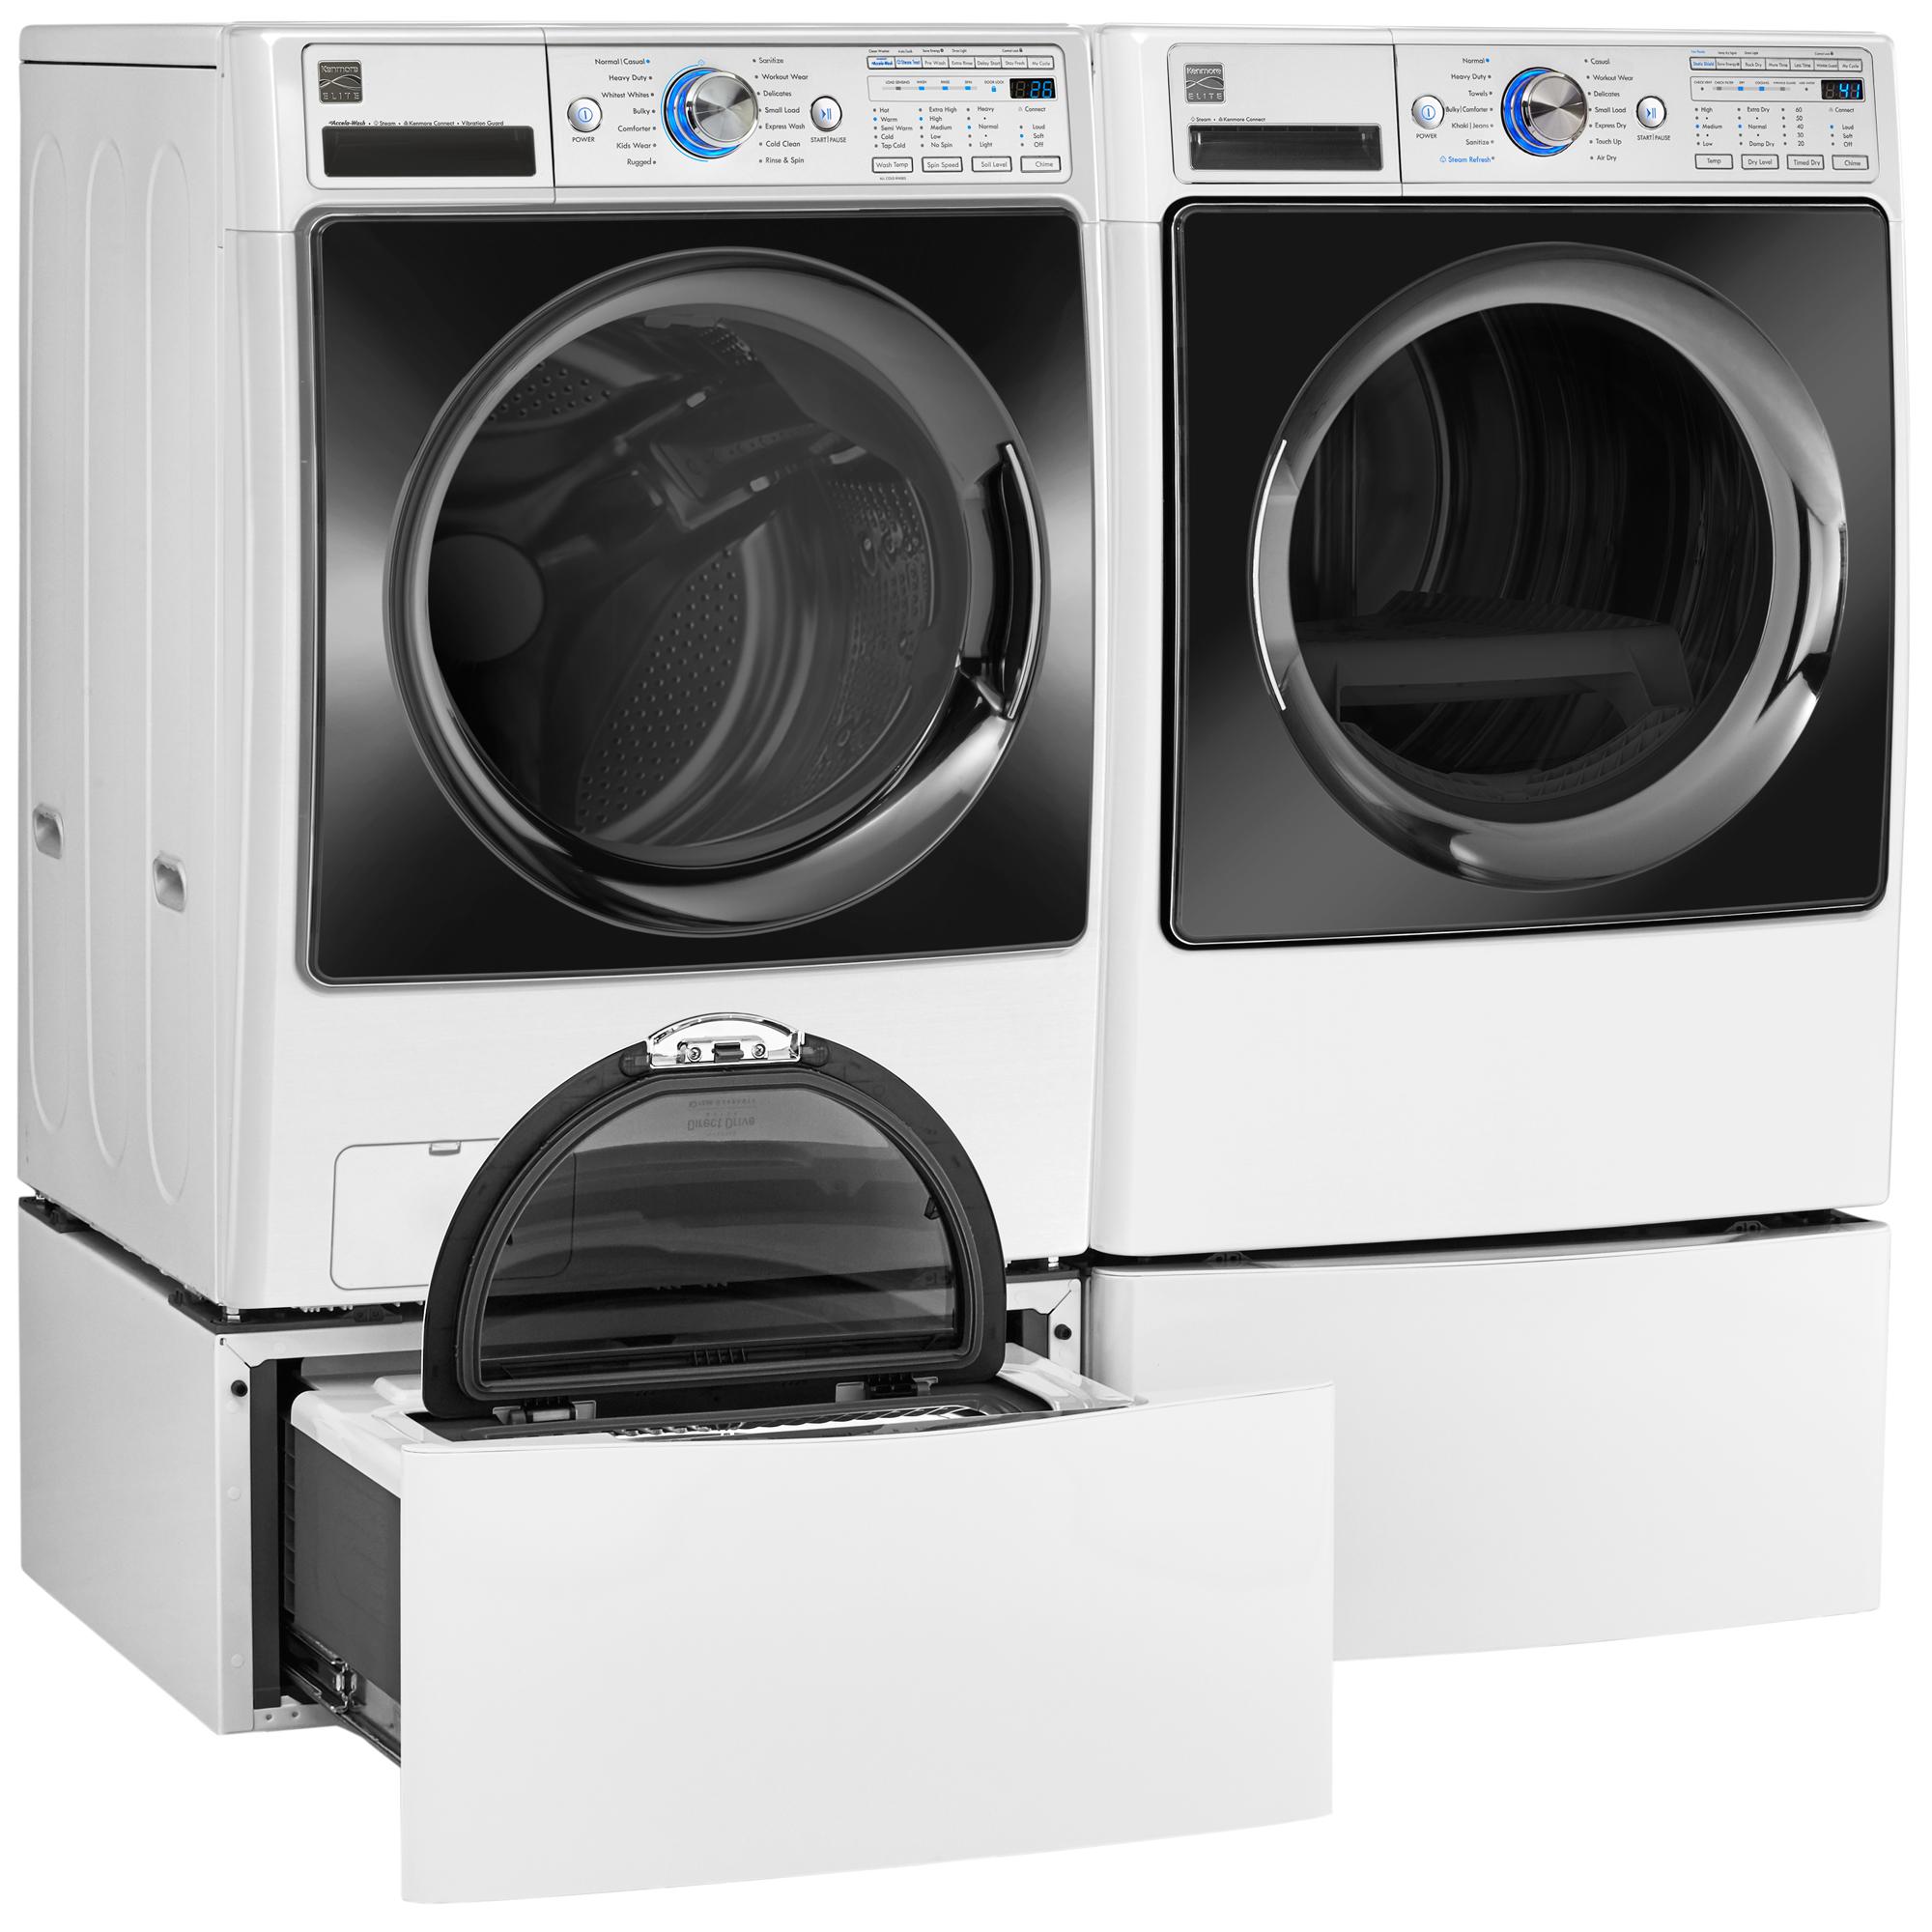 Kenmore Elite 81582 7.4 cu. ft. Electric Dryer w/ Steam